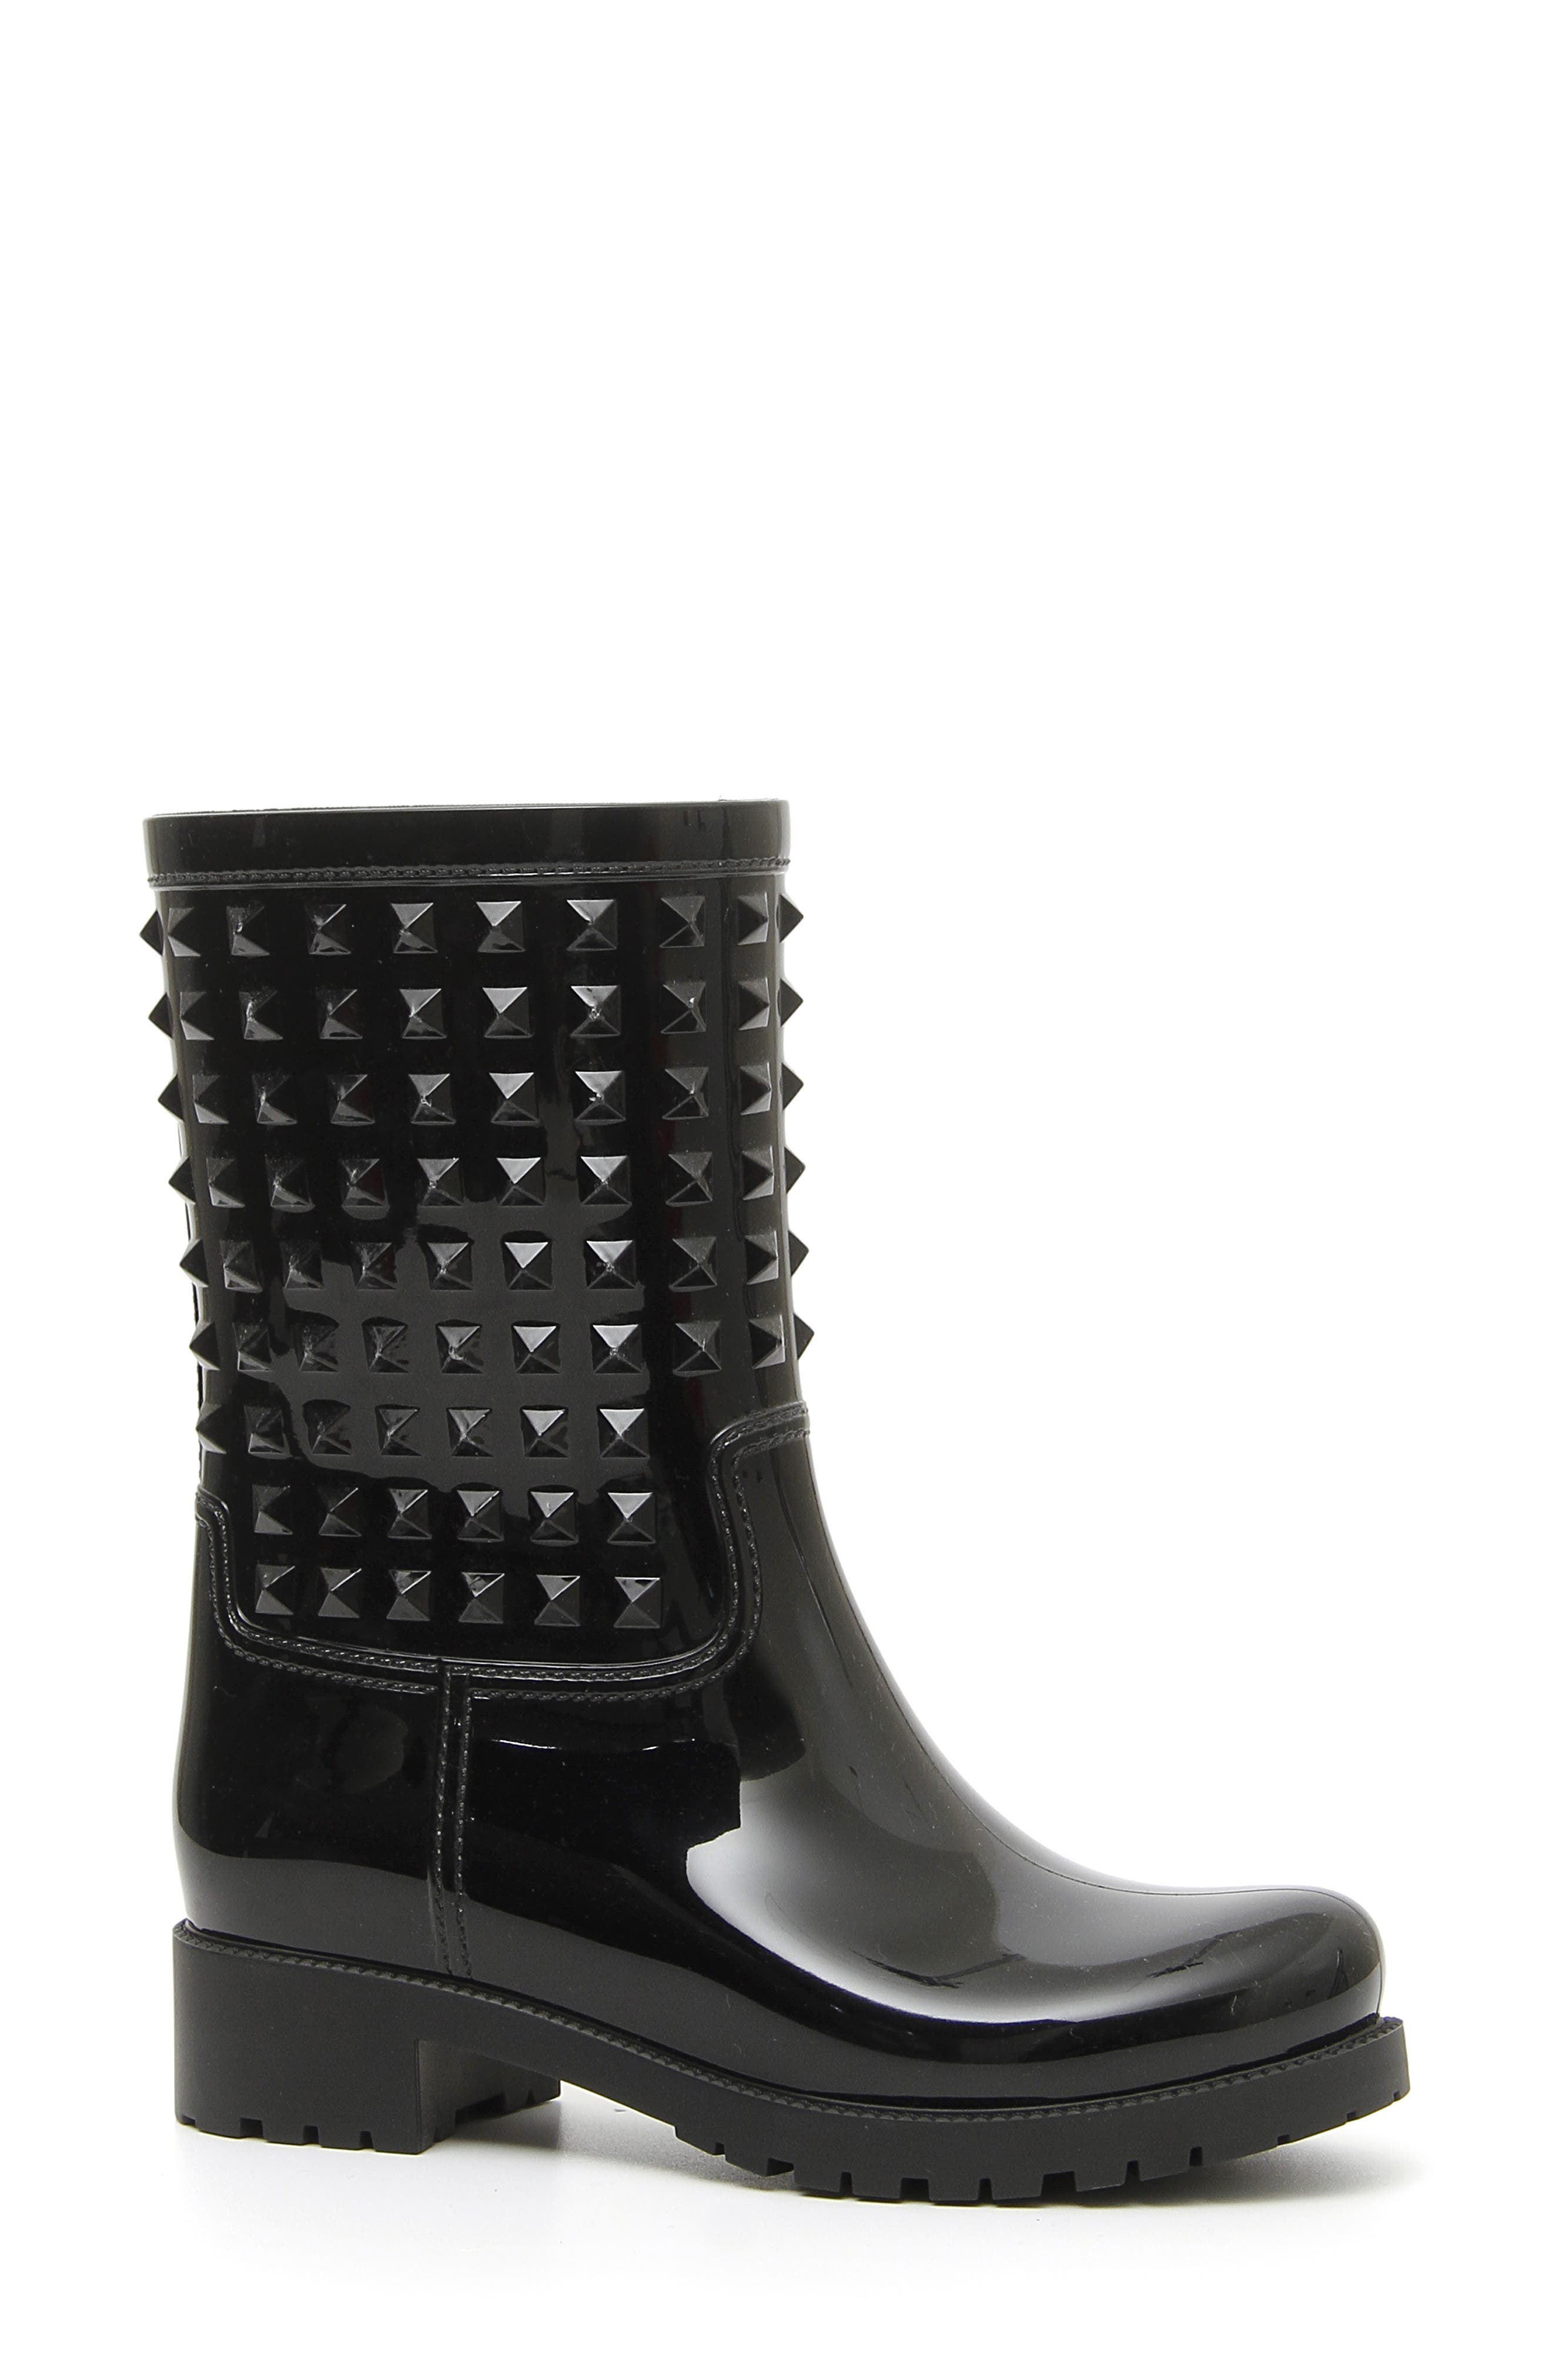 VALENTINO GARAVANI Rockstud Rain Boot, Main, color, BLACK